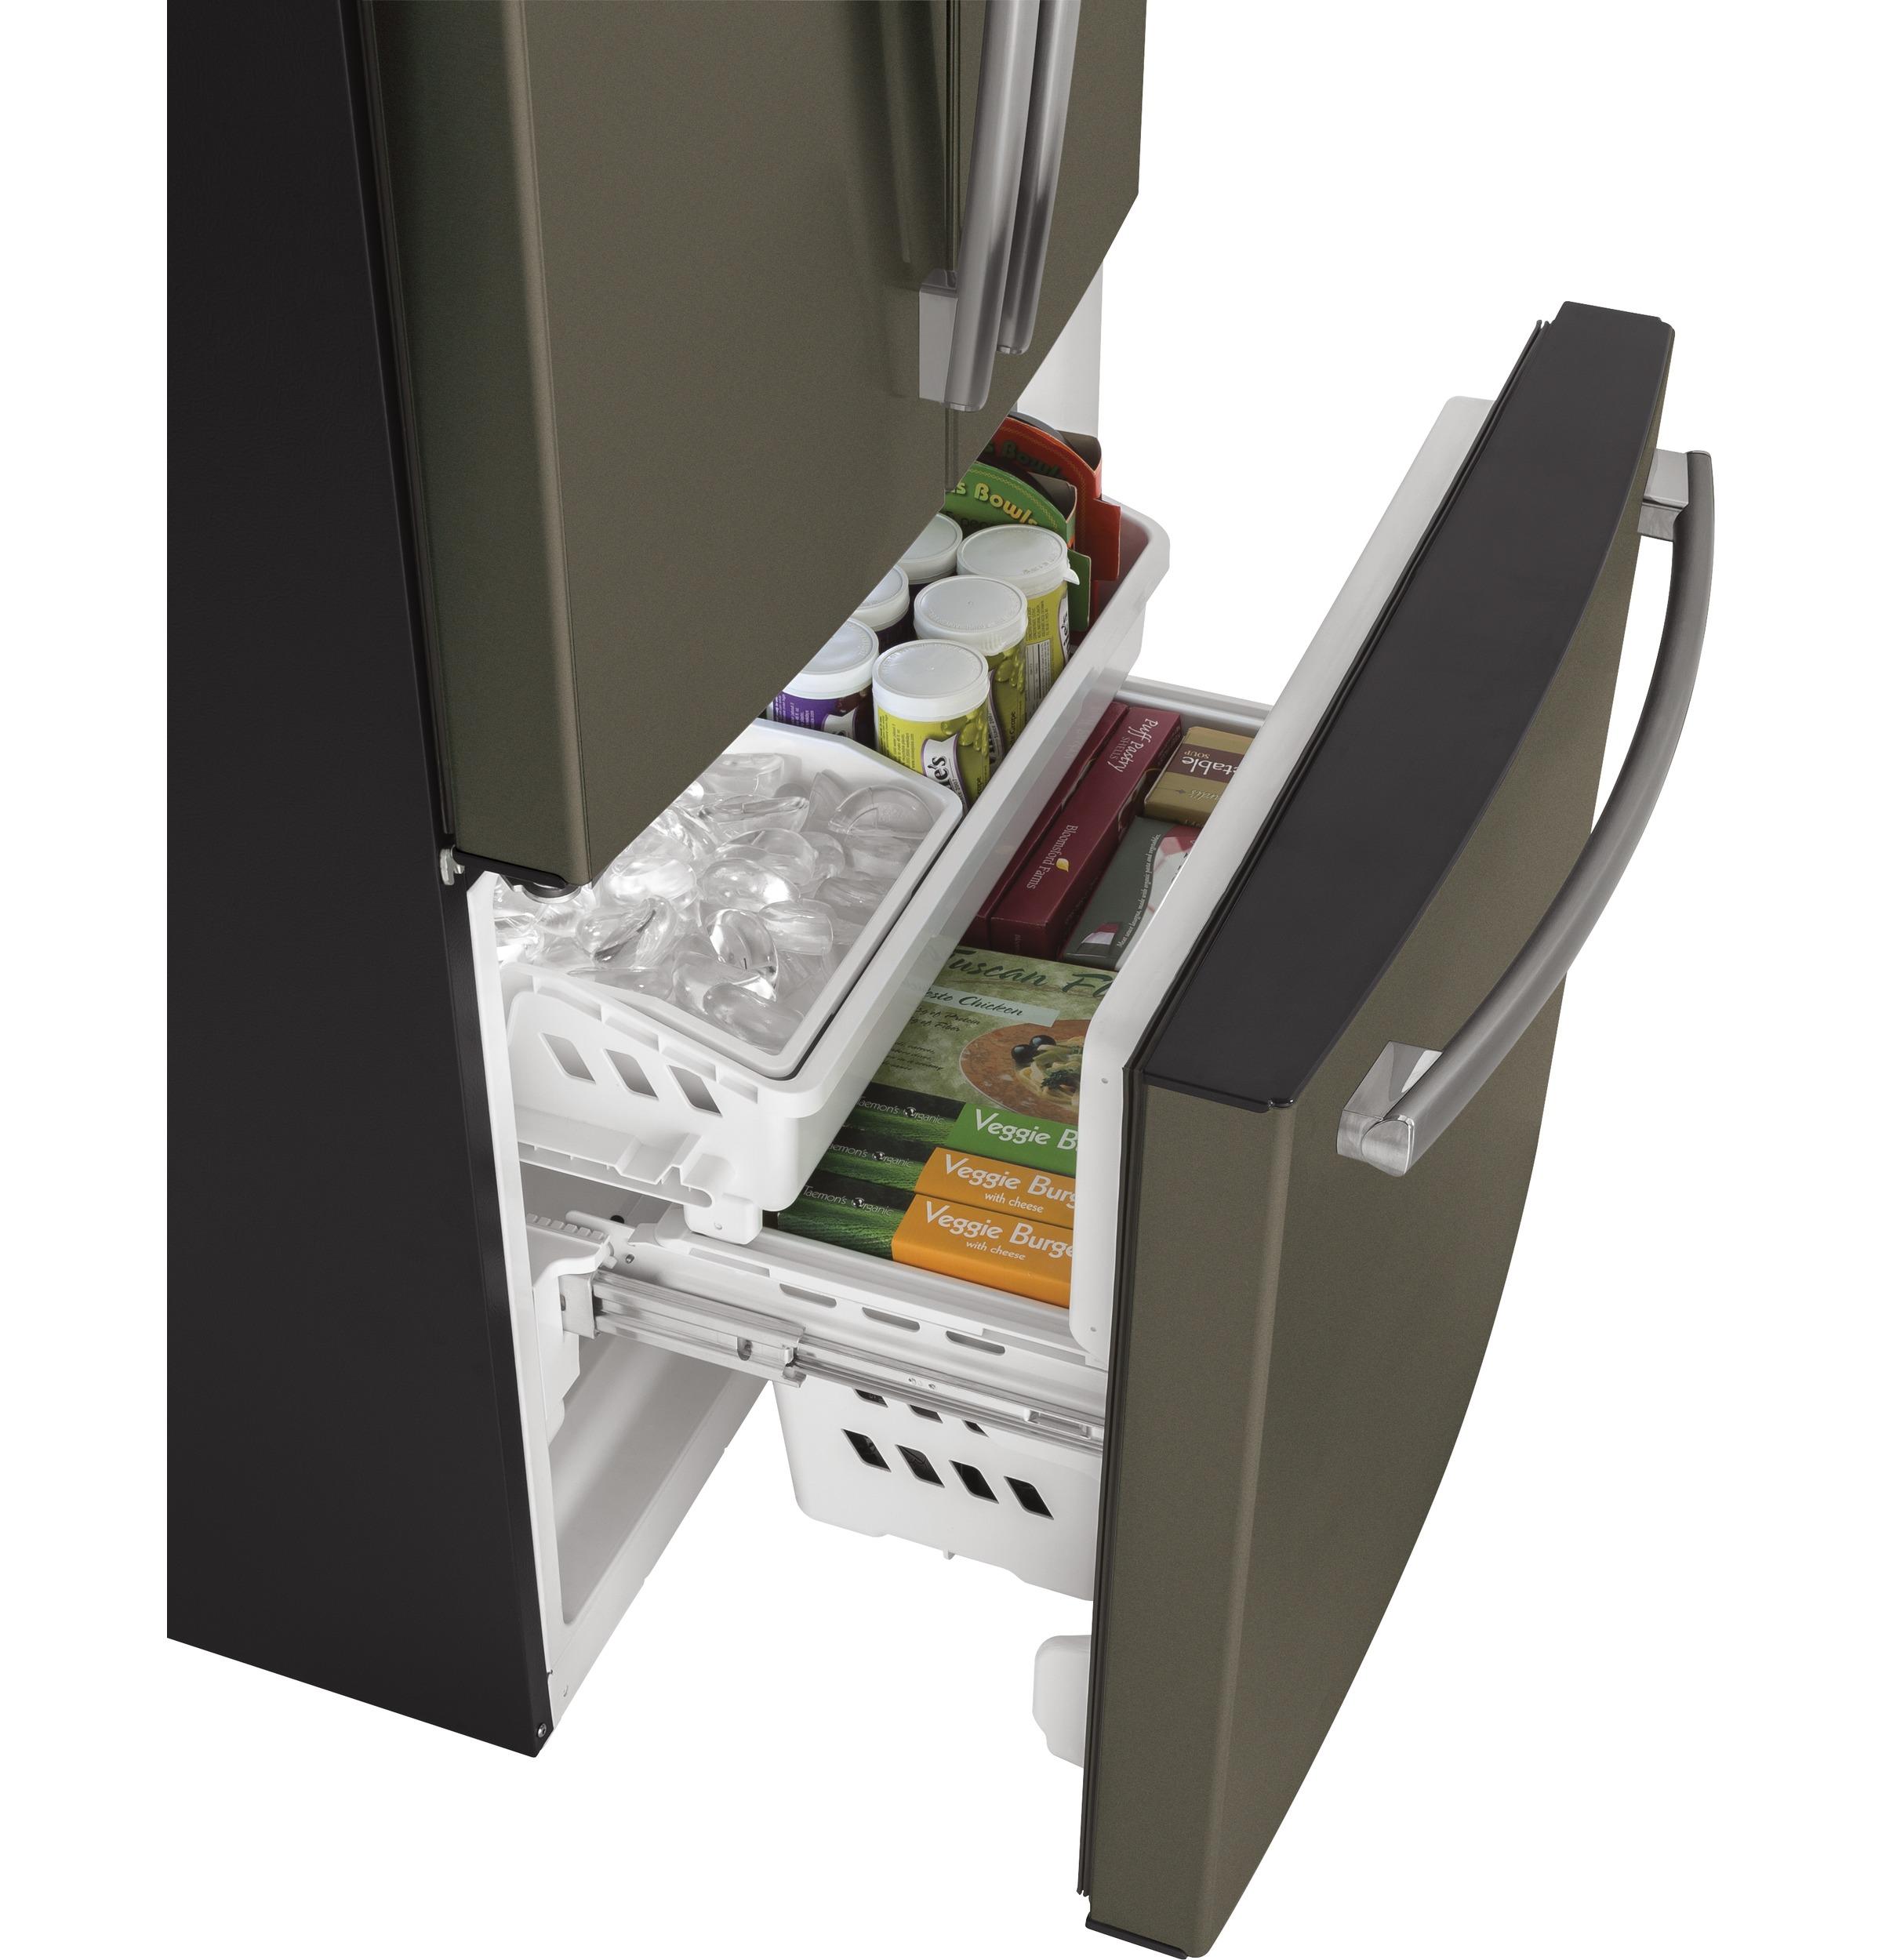 Model: GWE19JMLES | GE® ENERGY STAR® 18.6 Cu. Ft. Counter-Depth French-Door Refrigerator